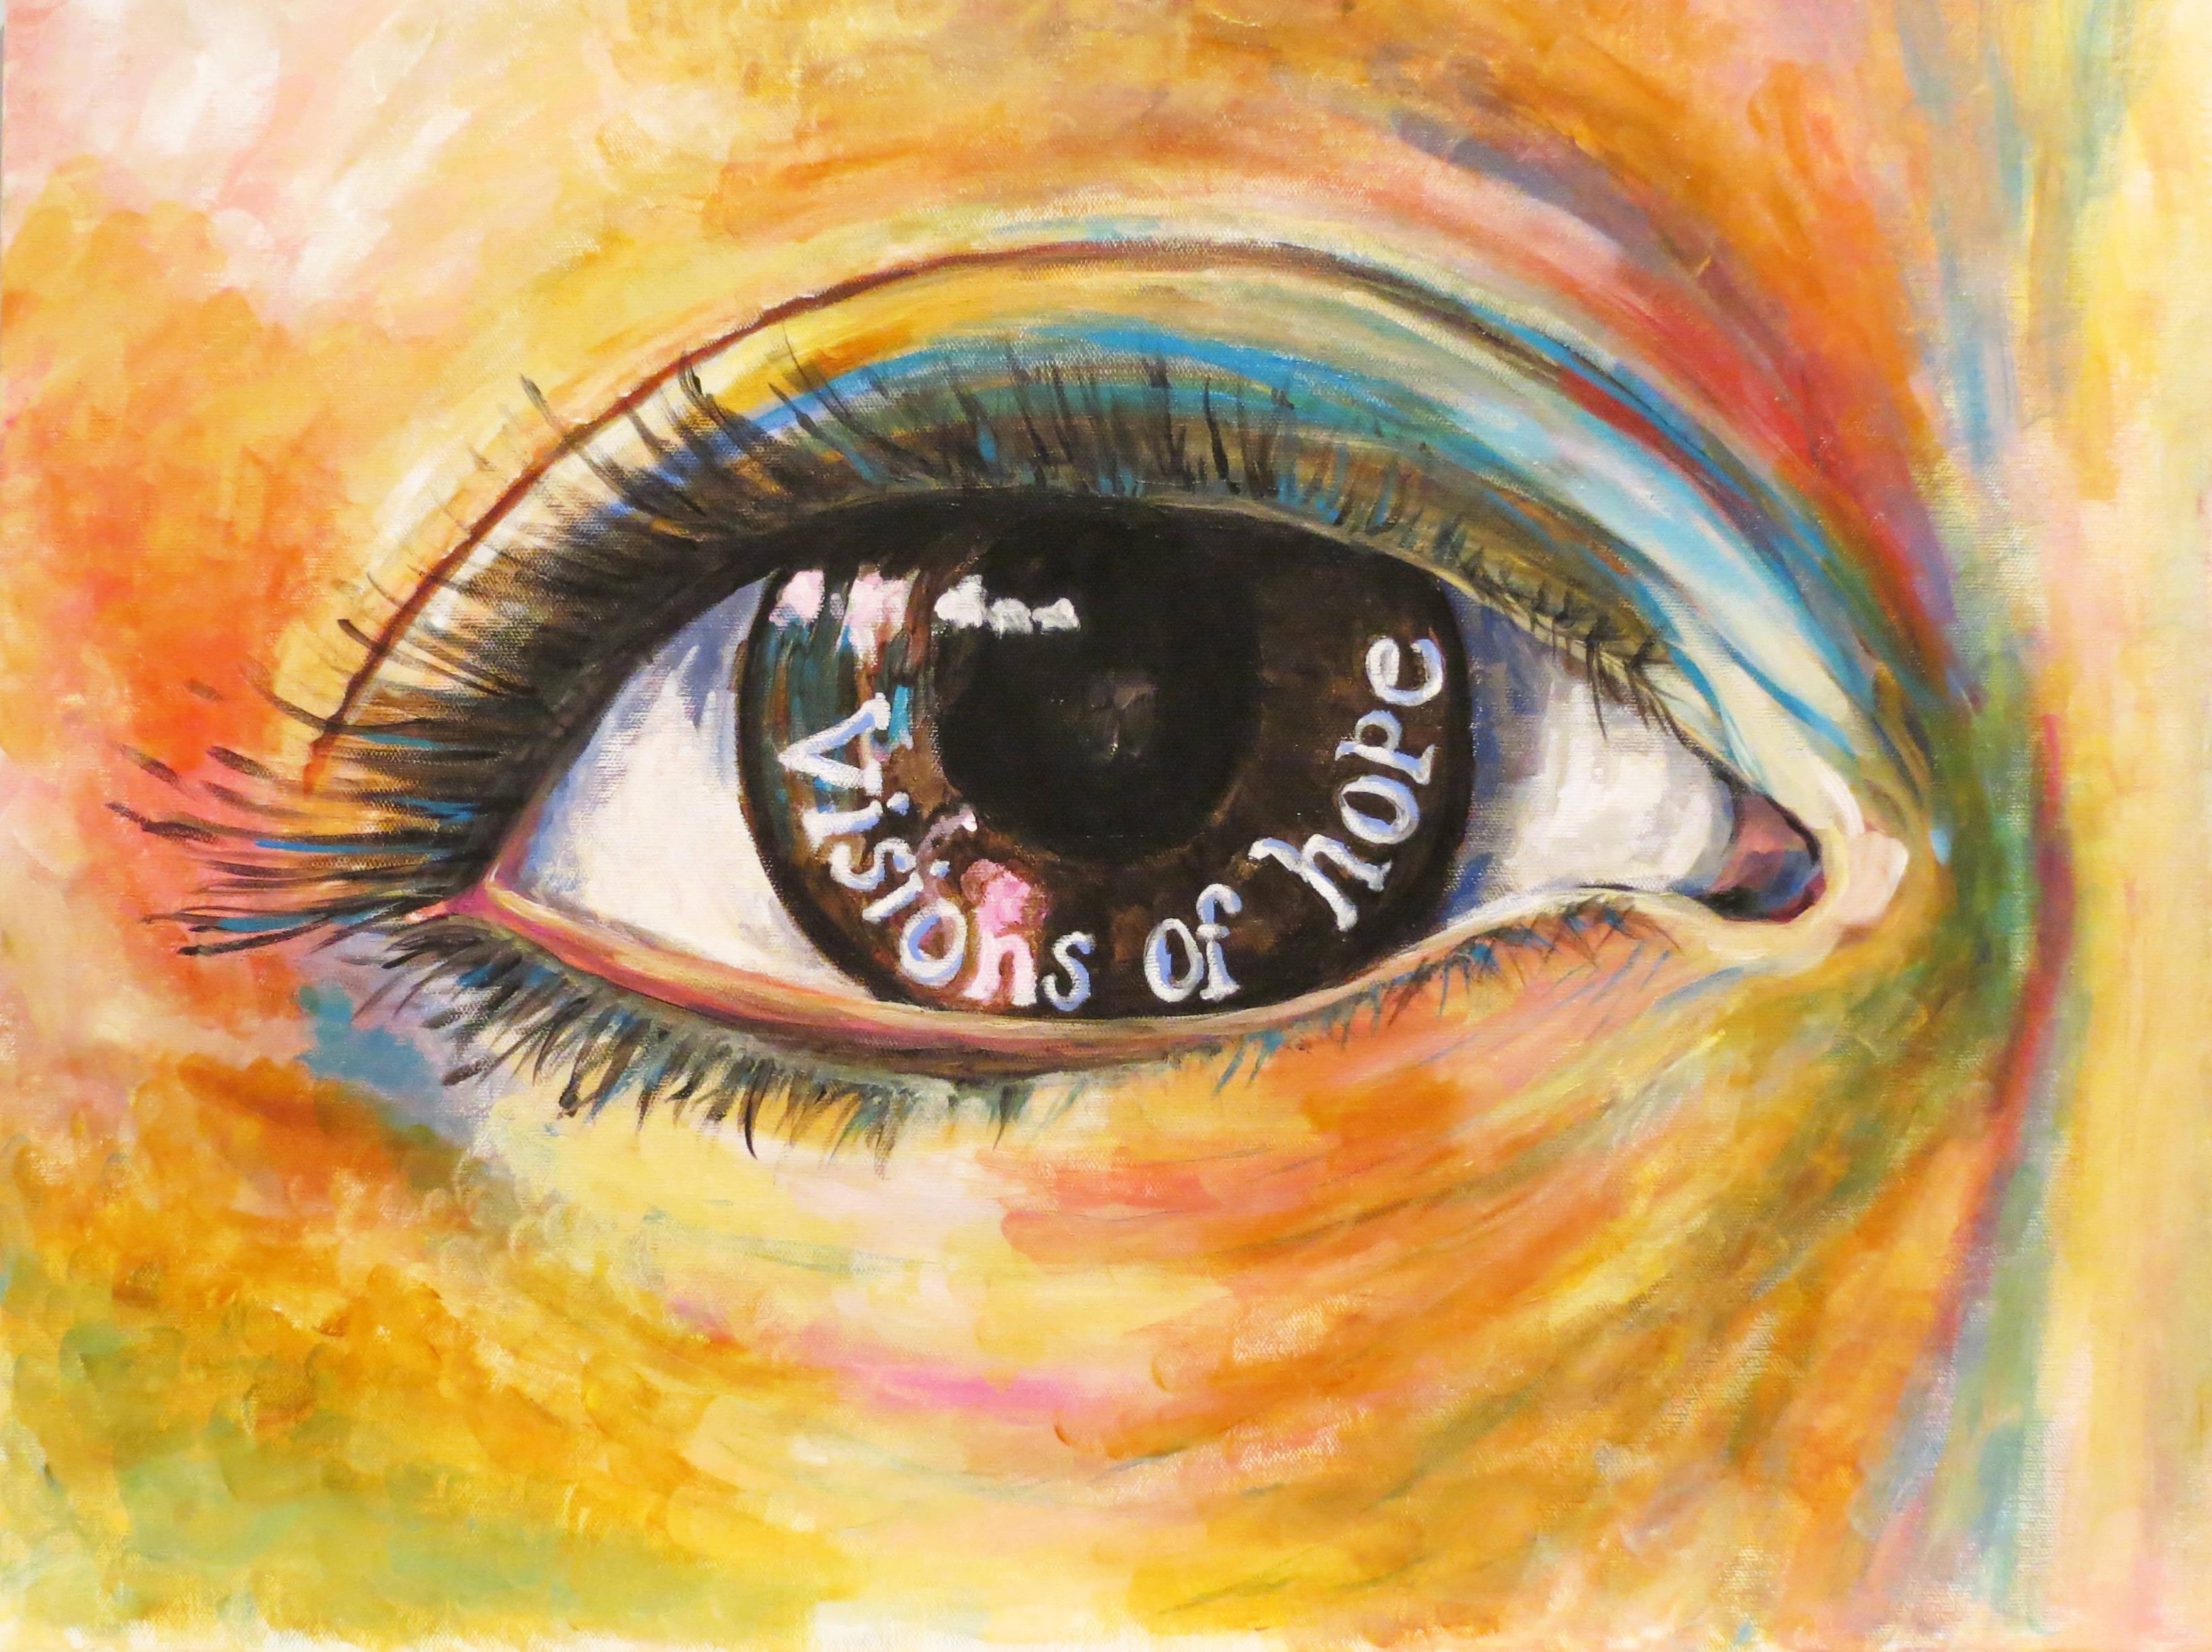 5750334edad6abf9b2fa_Susan_Schaffer_book_cover_image.jpg